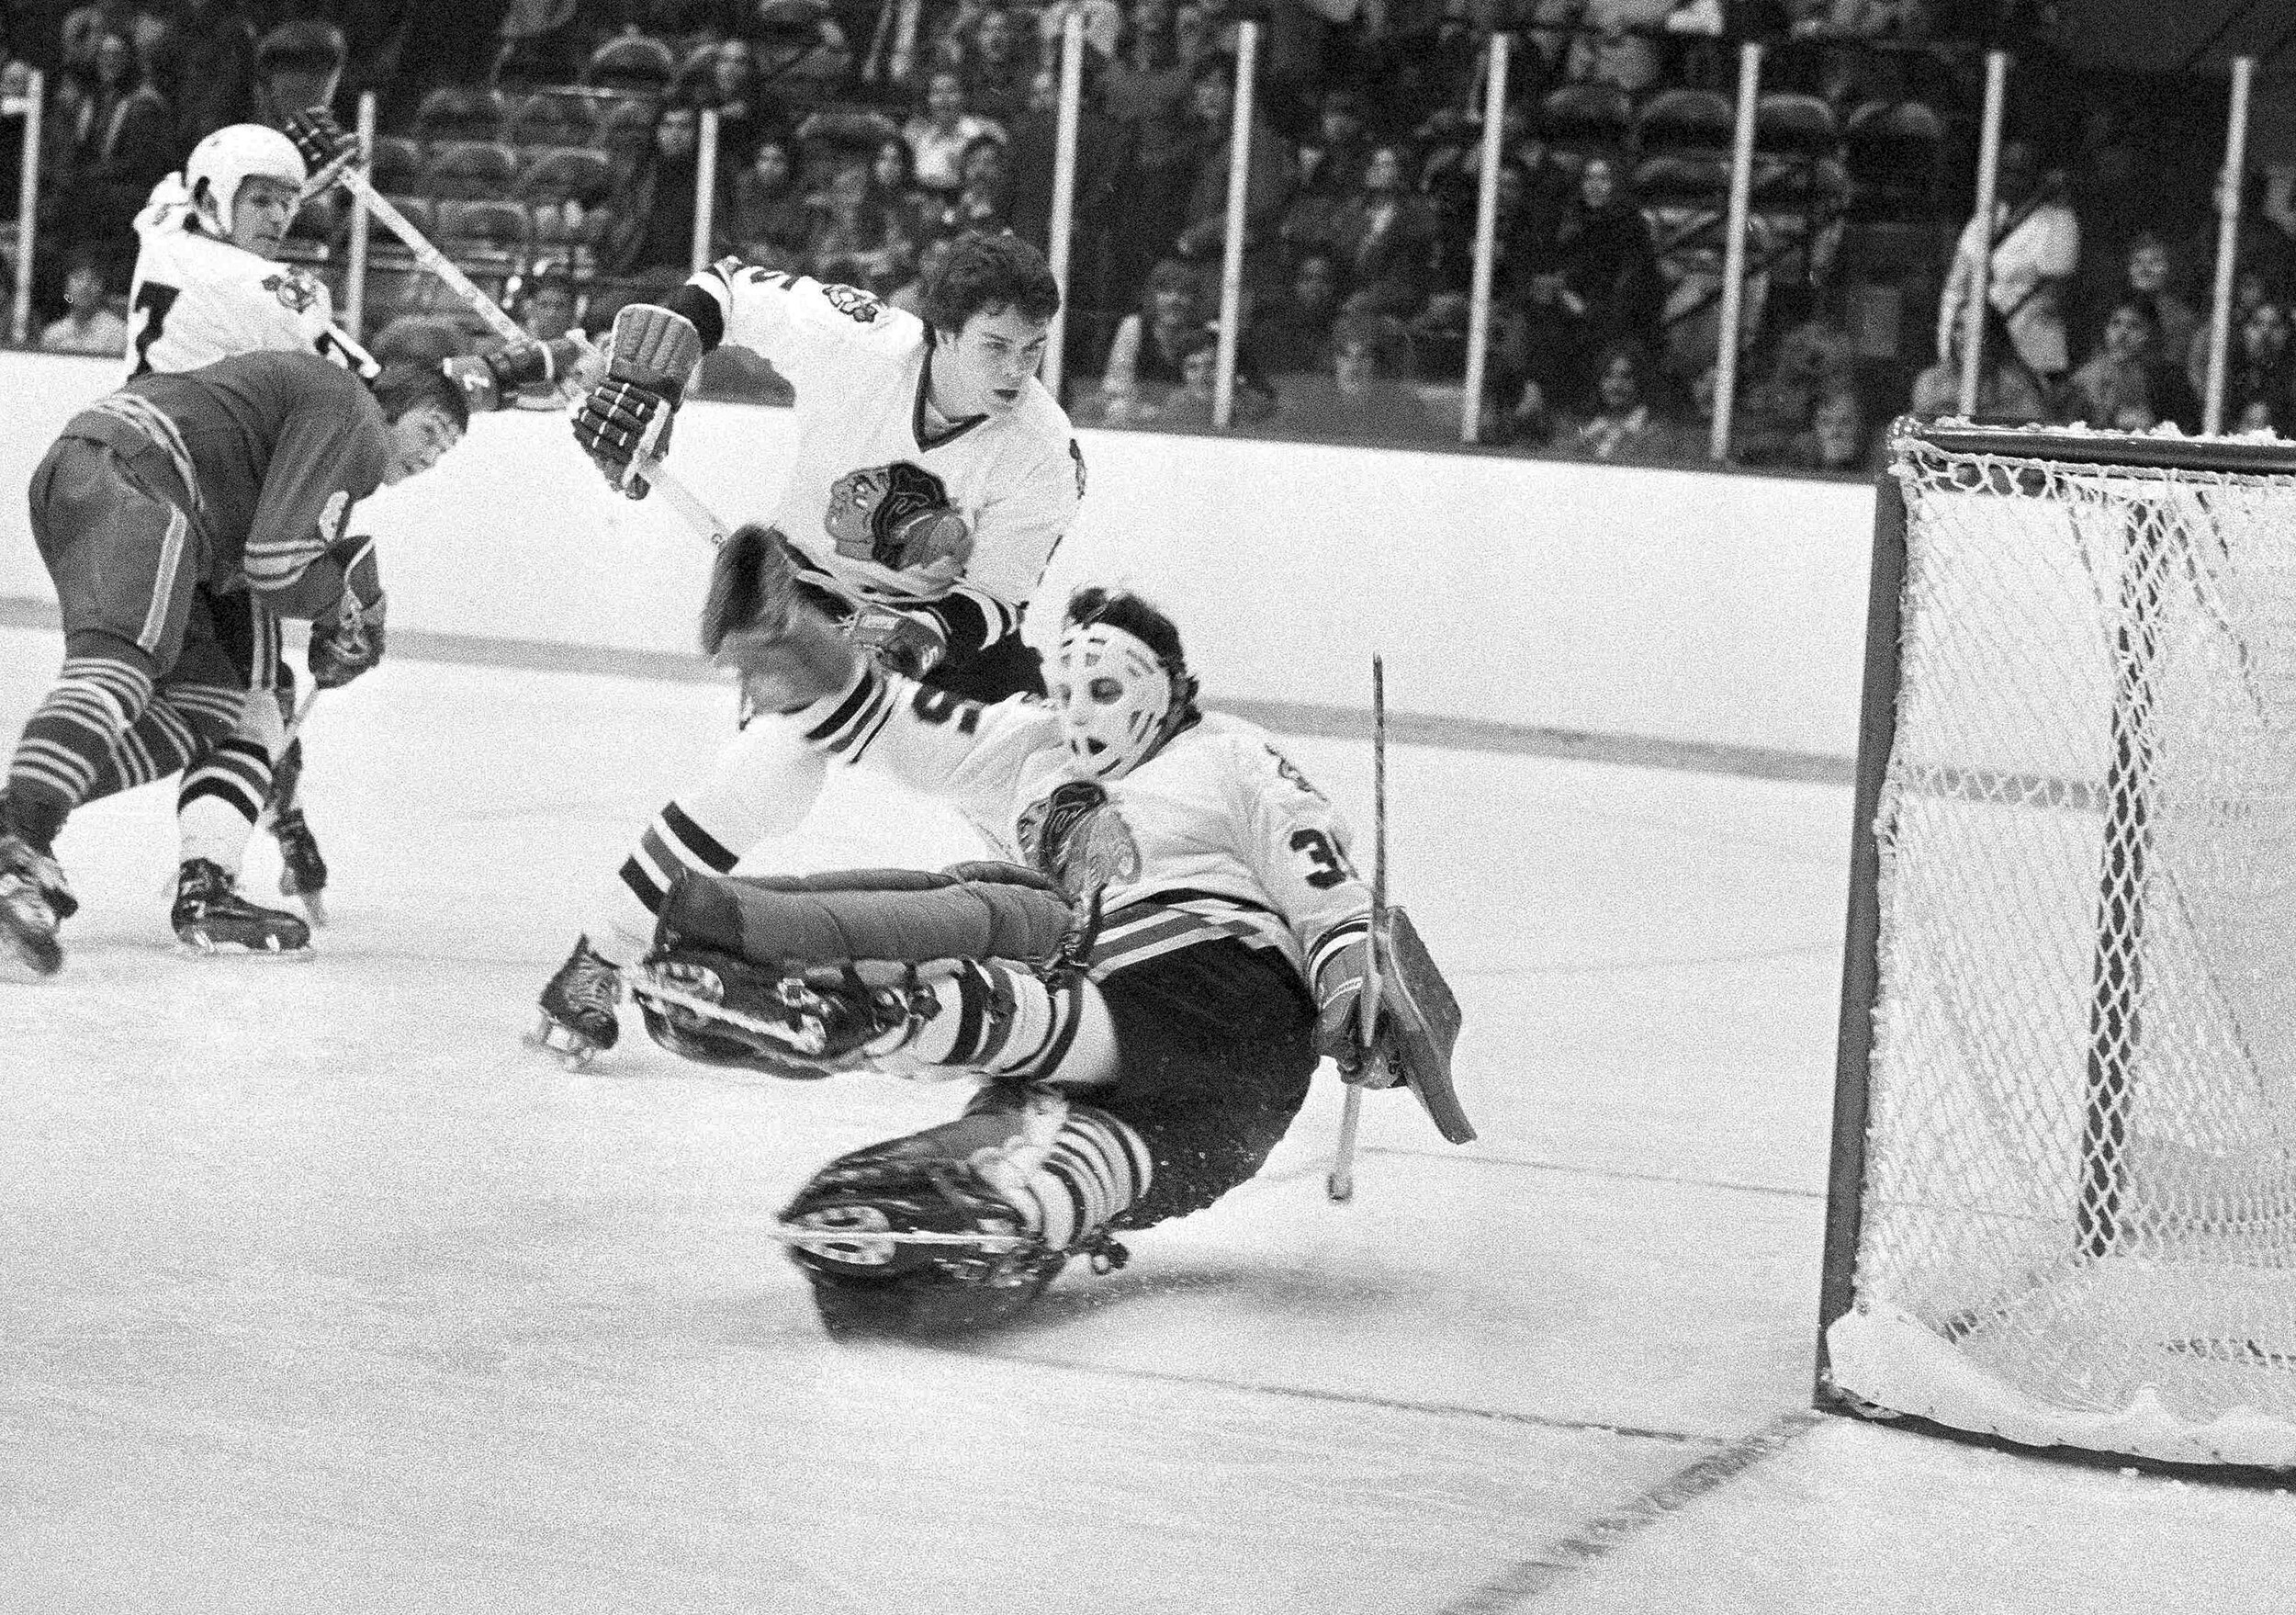 Tony Esposito, Hall of Fame NHL goaltender, dead at 78